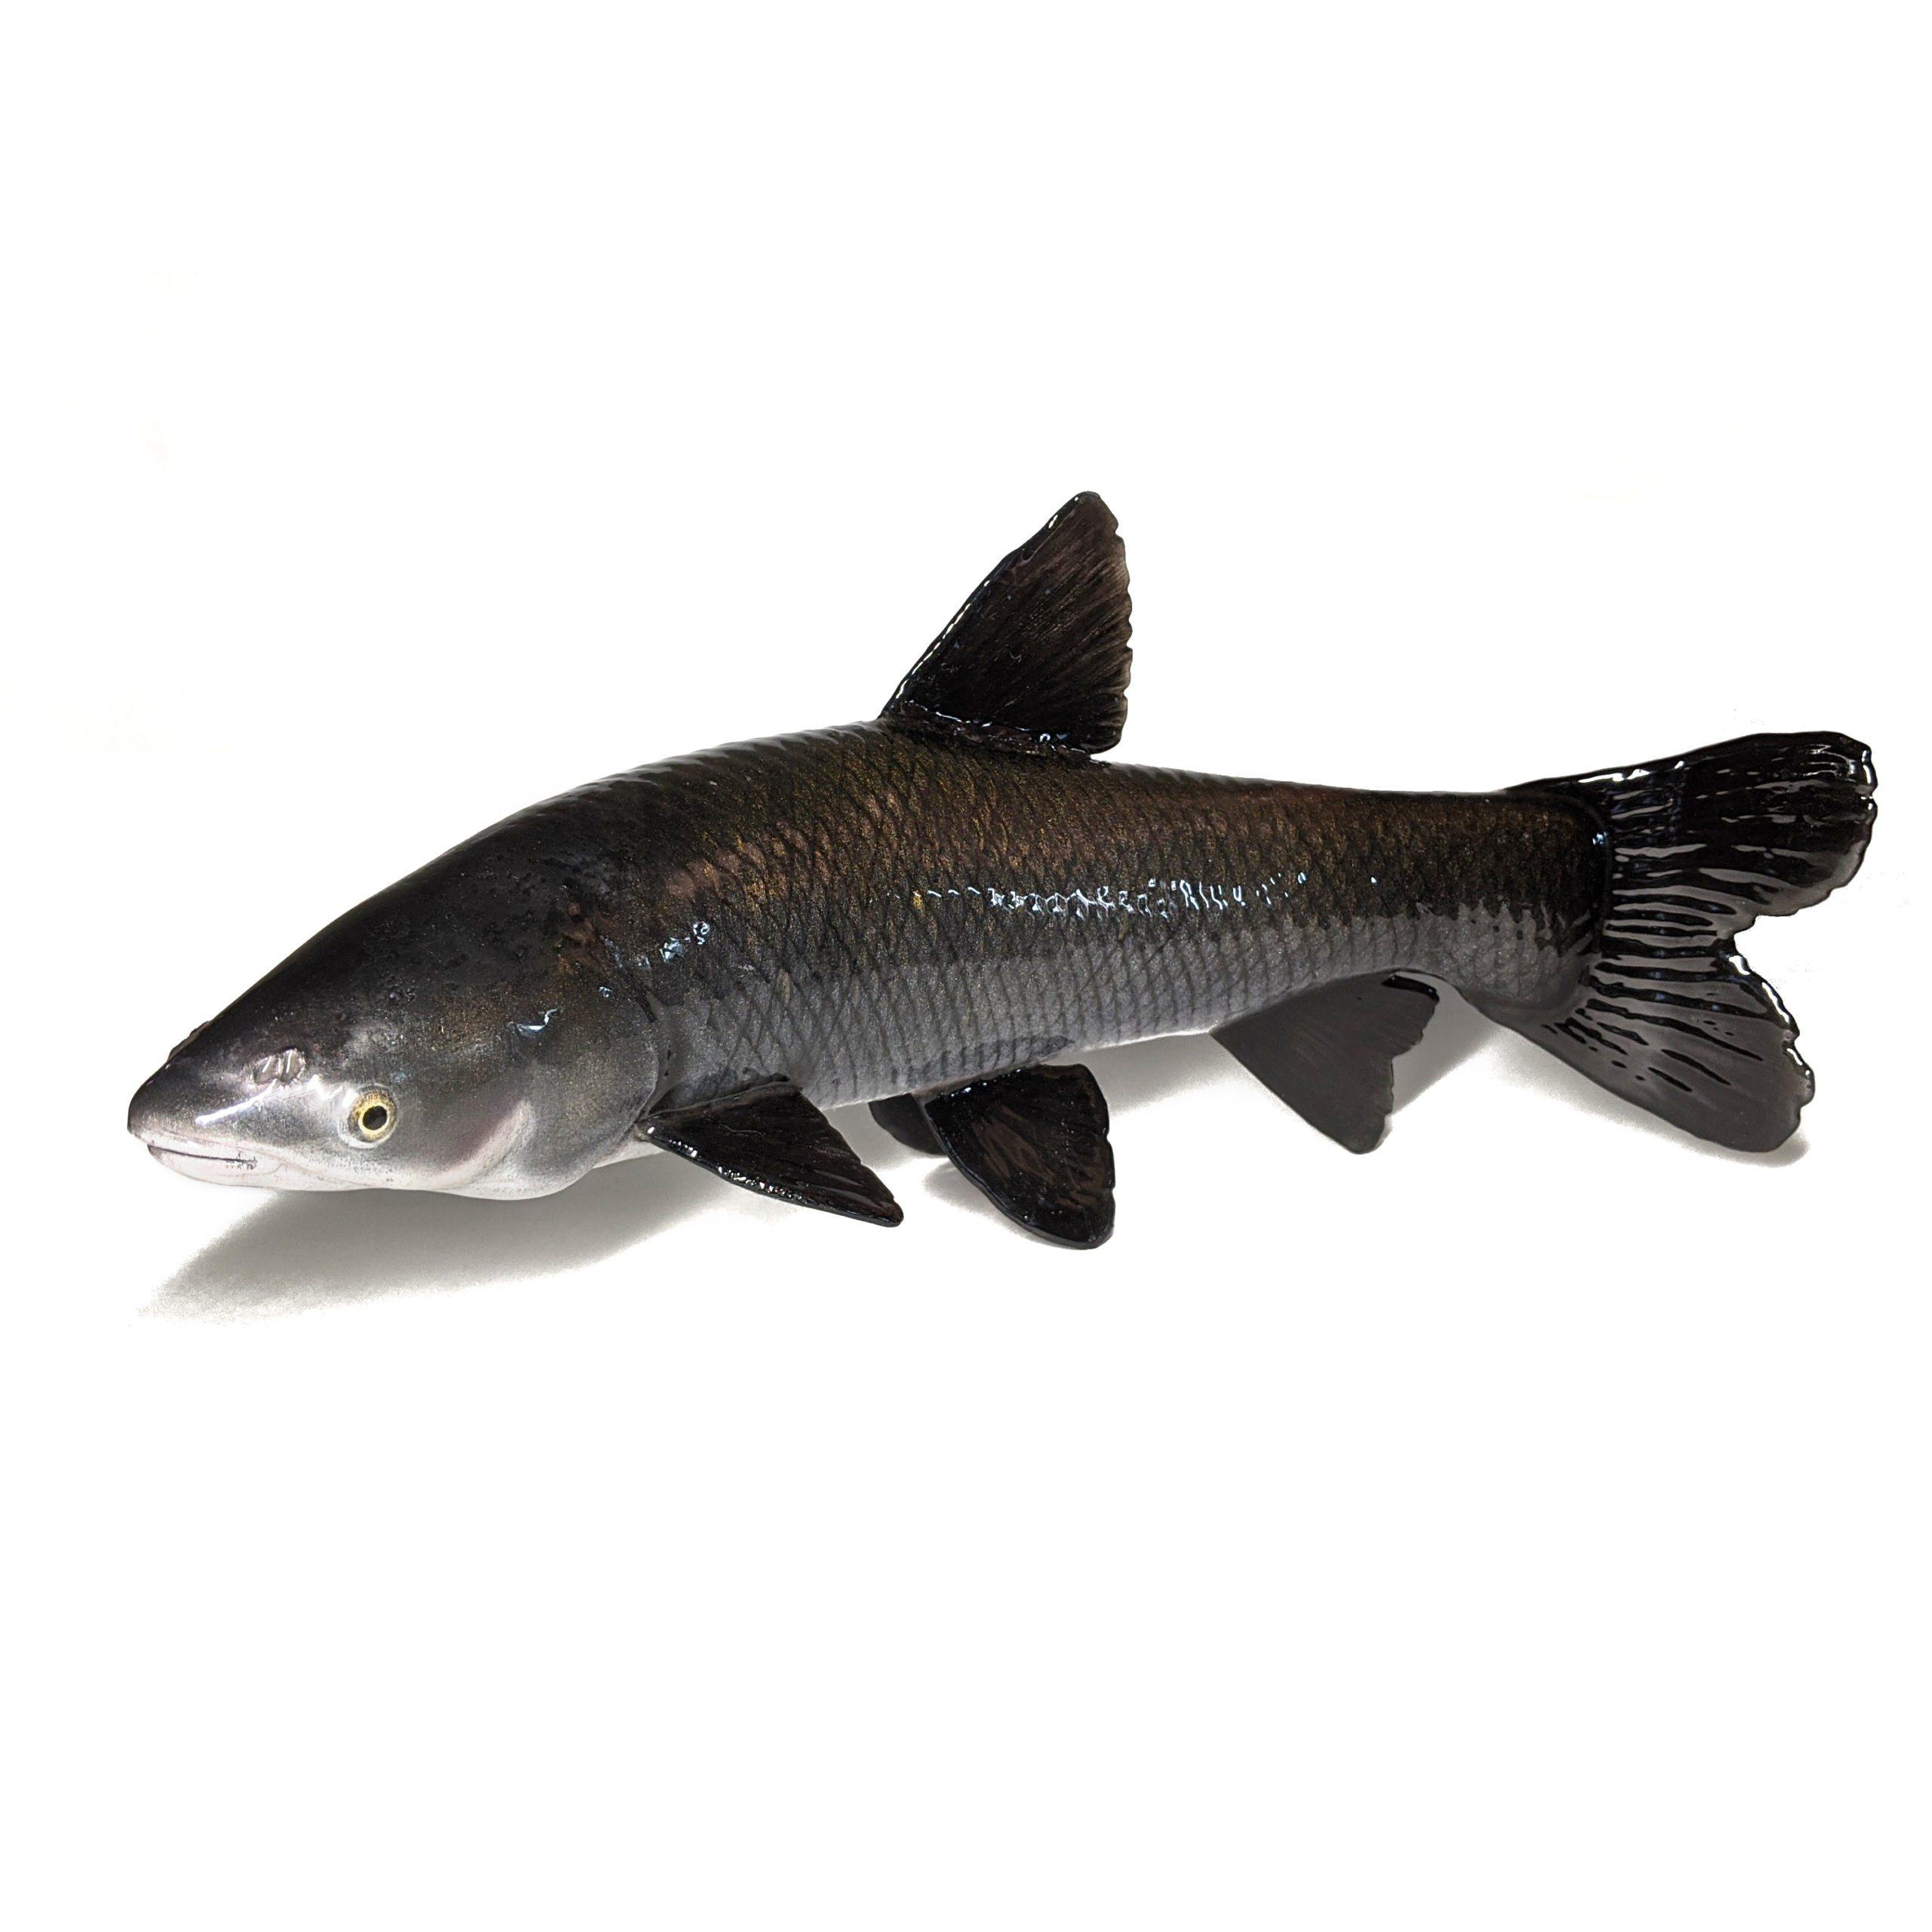 Black Carp (Mylopharyngodon Piceus) Model